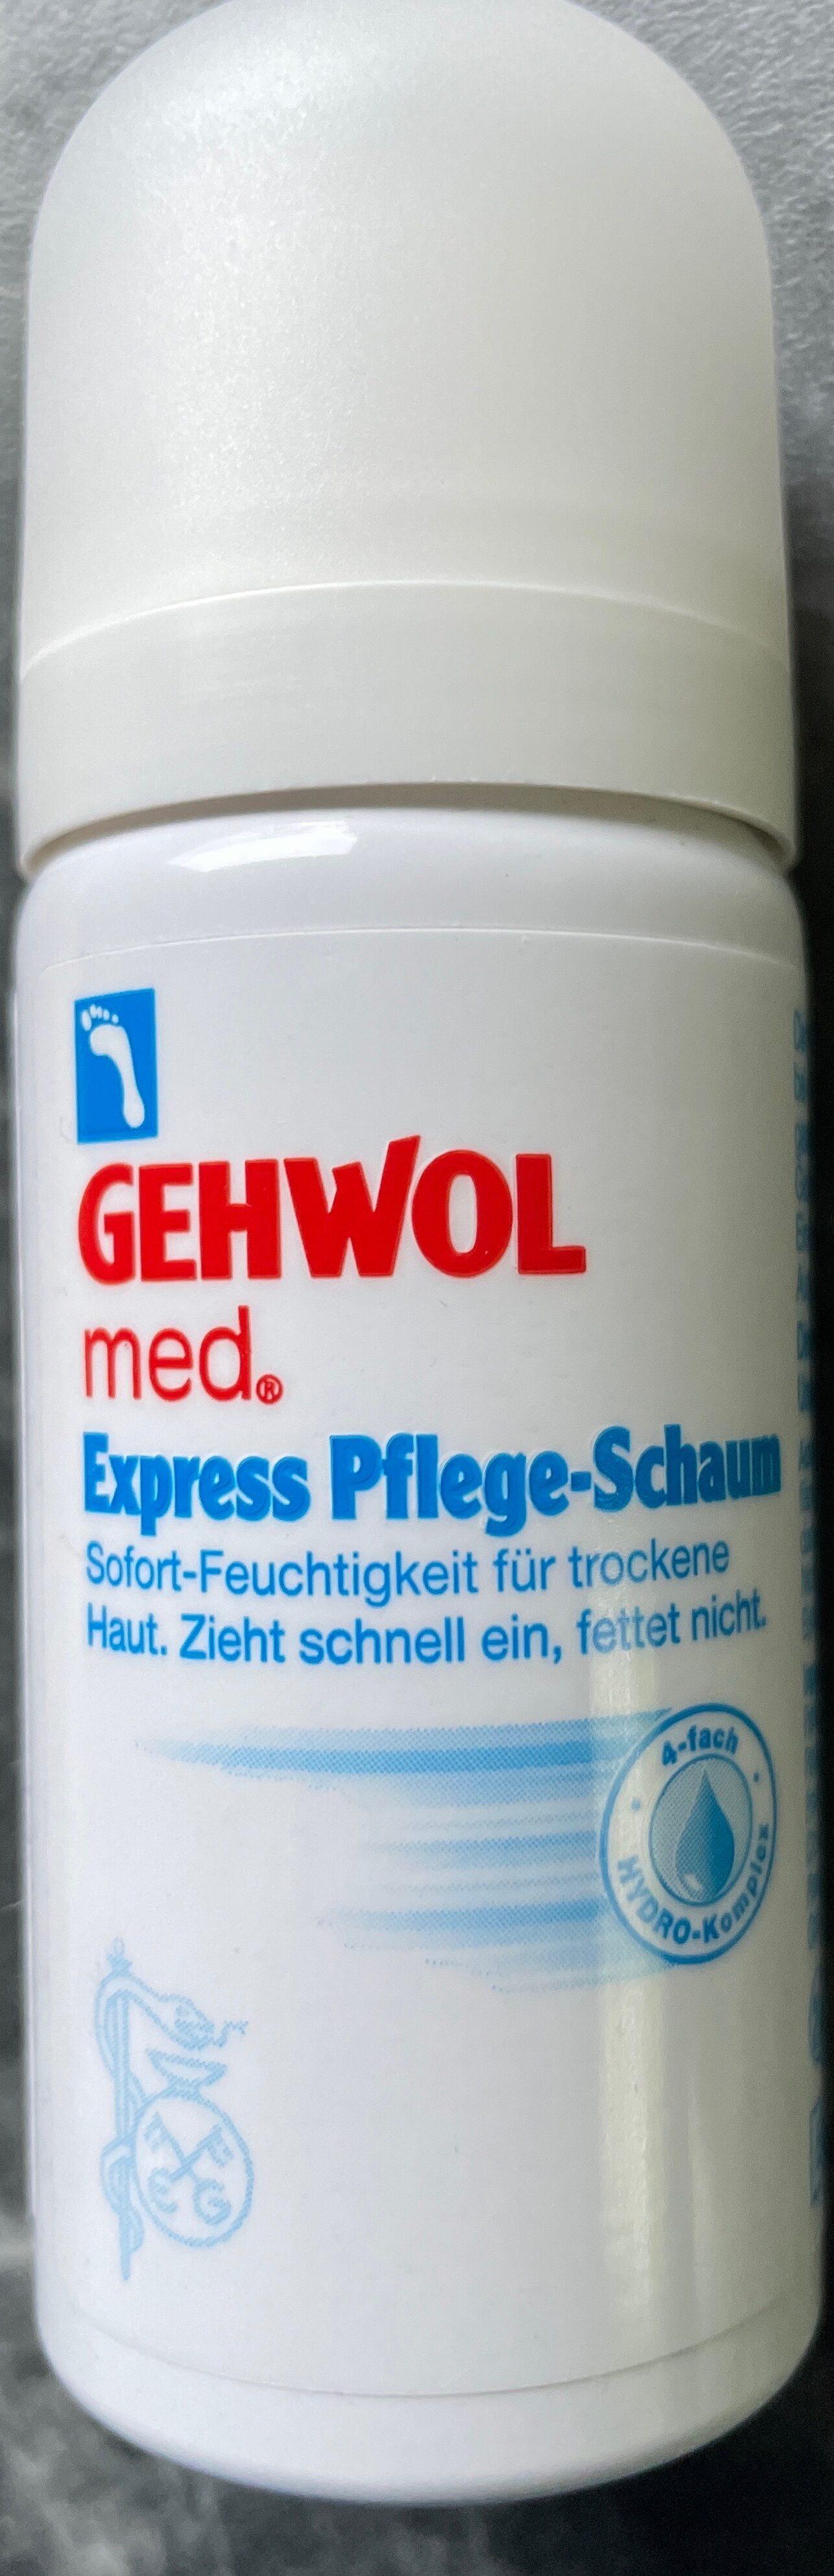 Express Pflege-Schaum - Product - de